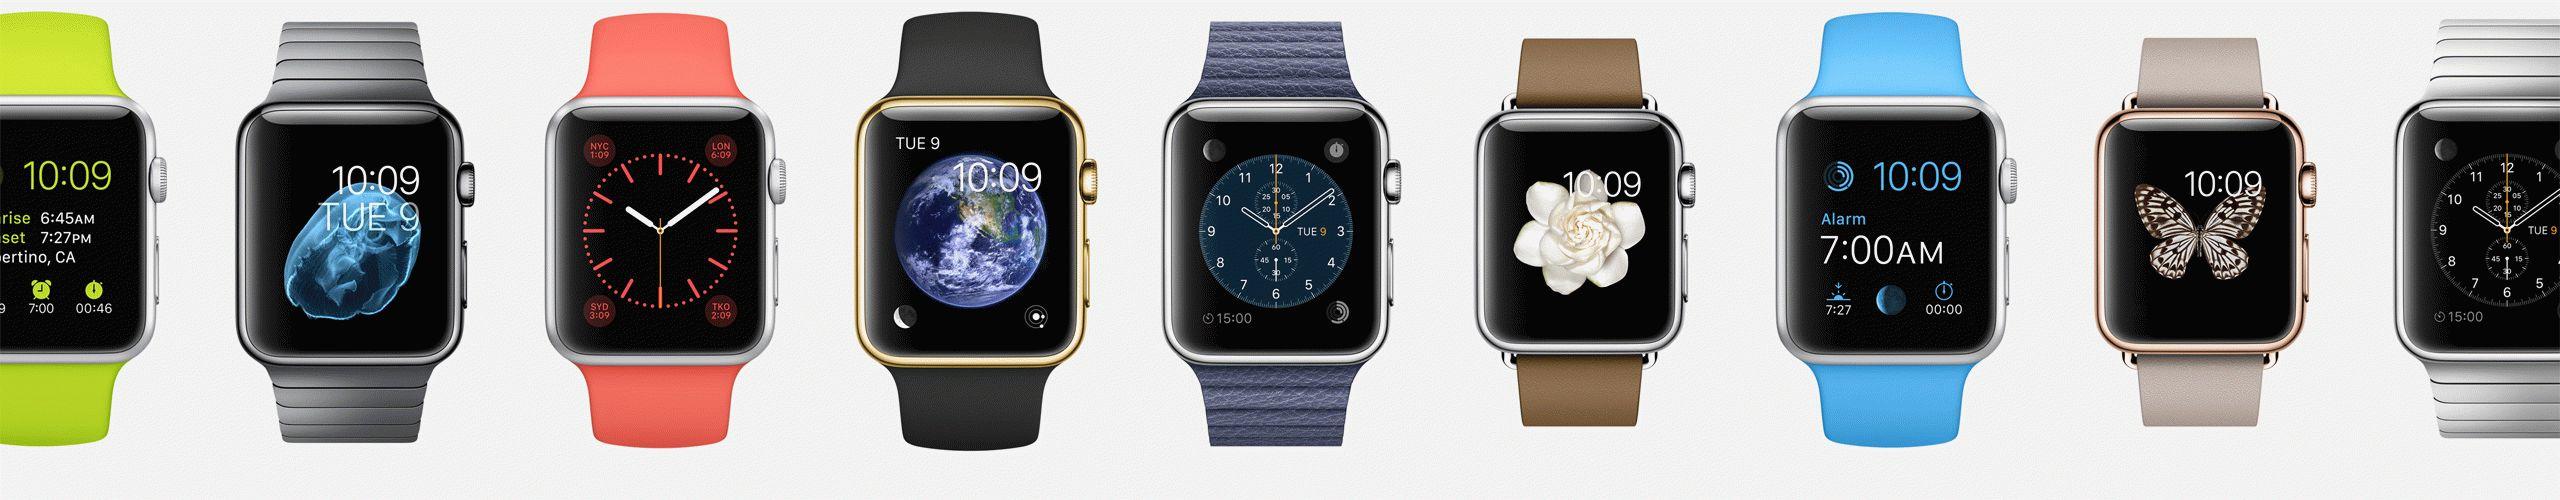 Apple-Watch-customizability